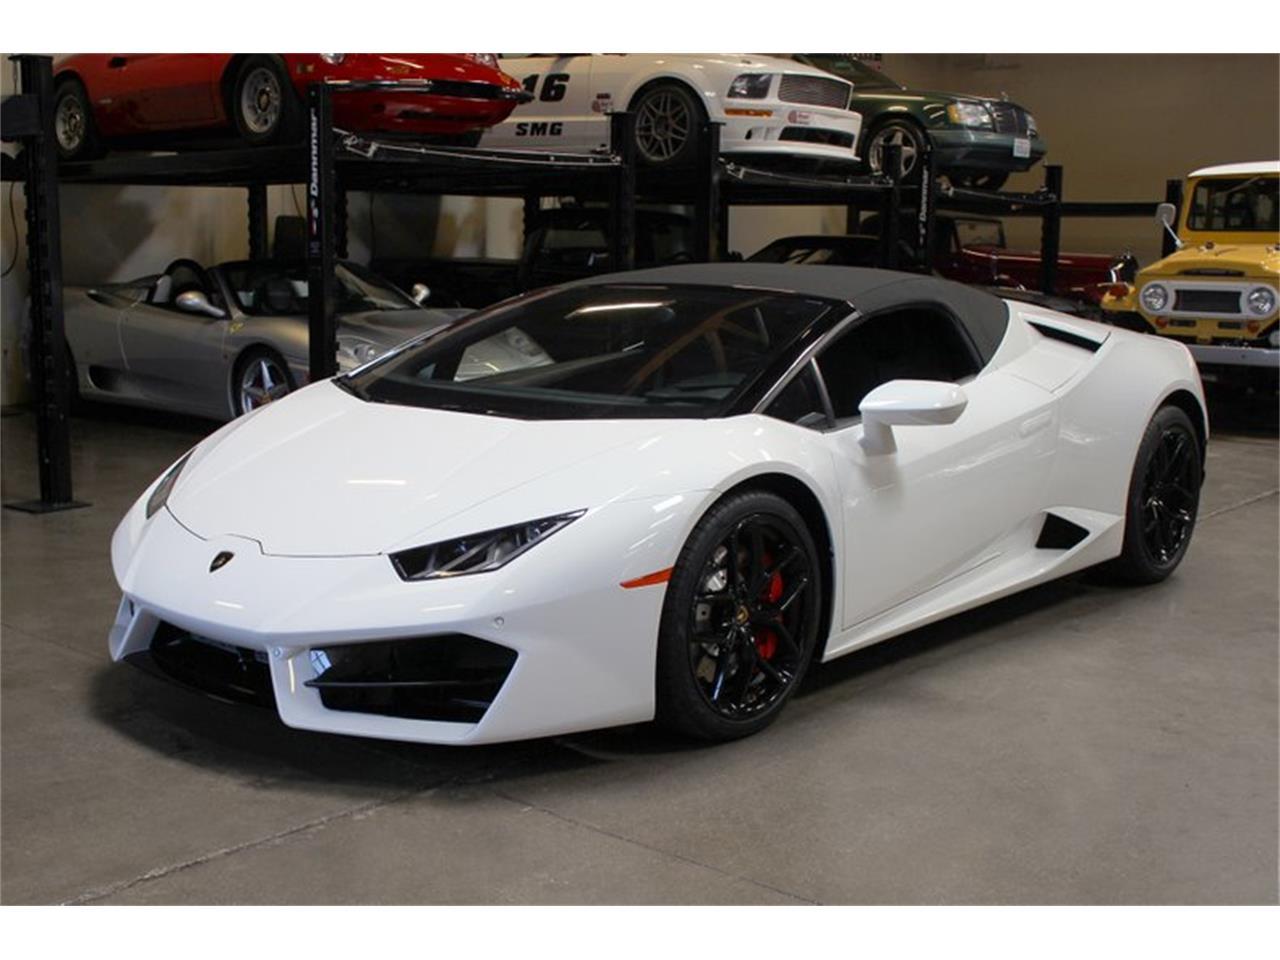 Large Picture of '17 Lamborghini Huracan located in California - $224,995.00 - PW1E